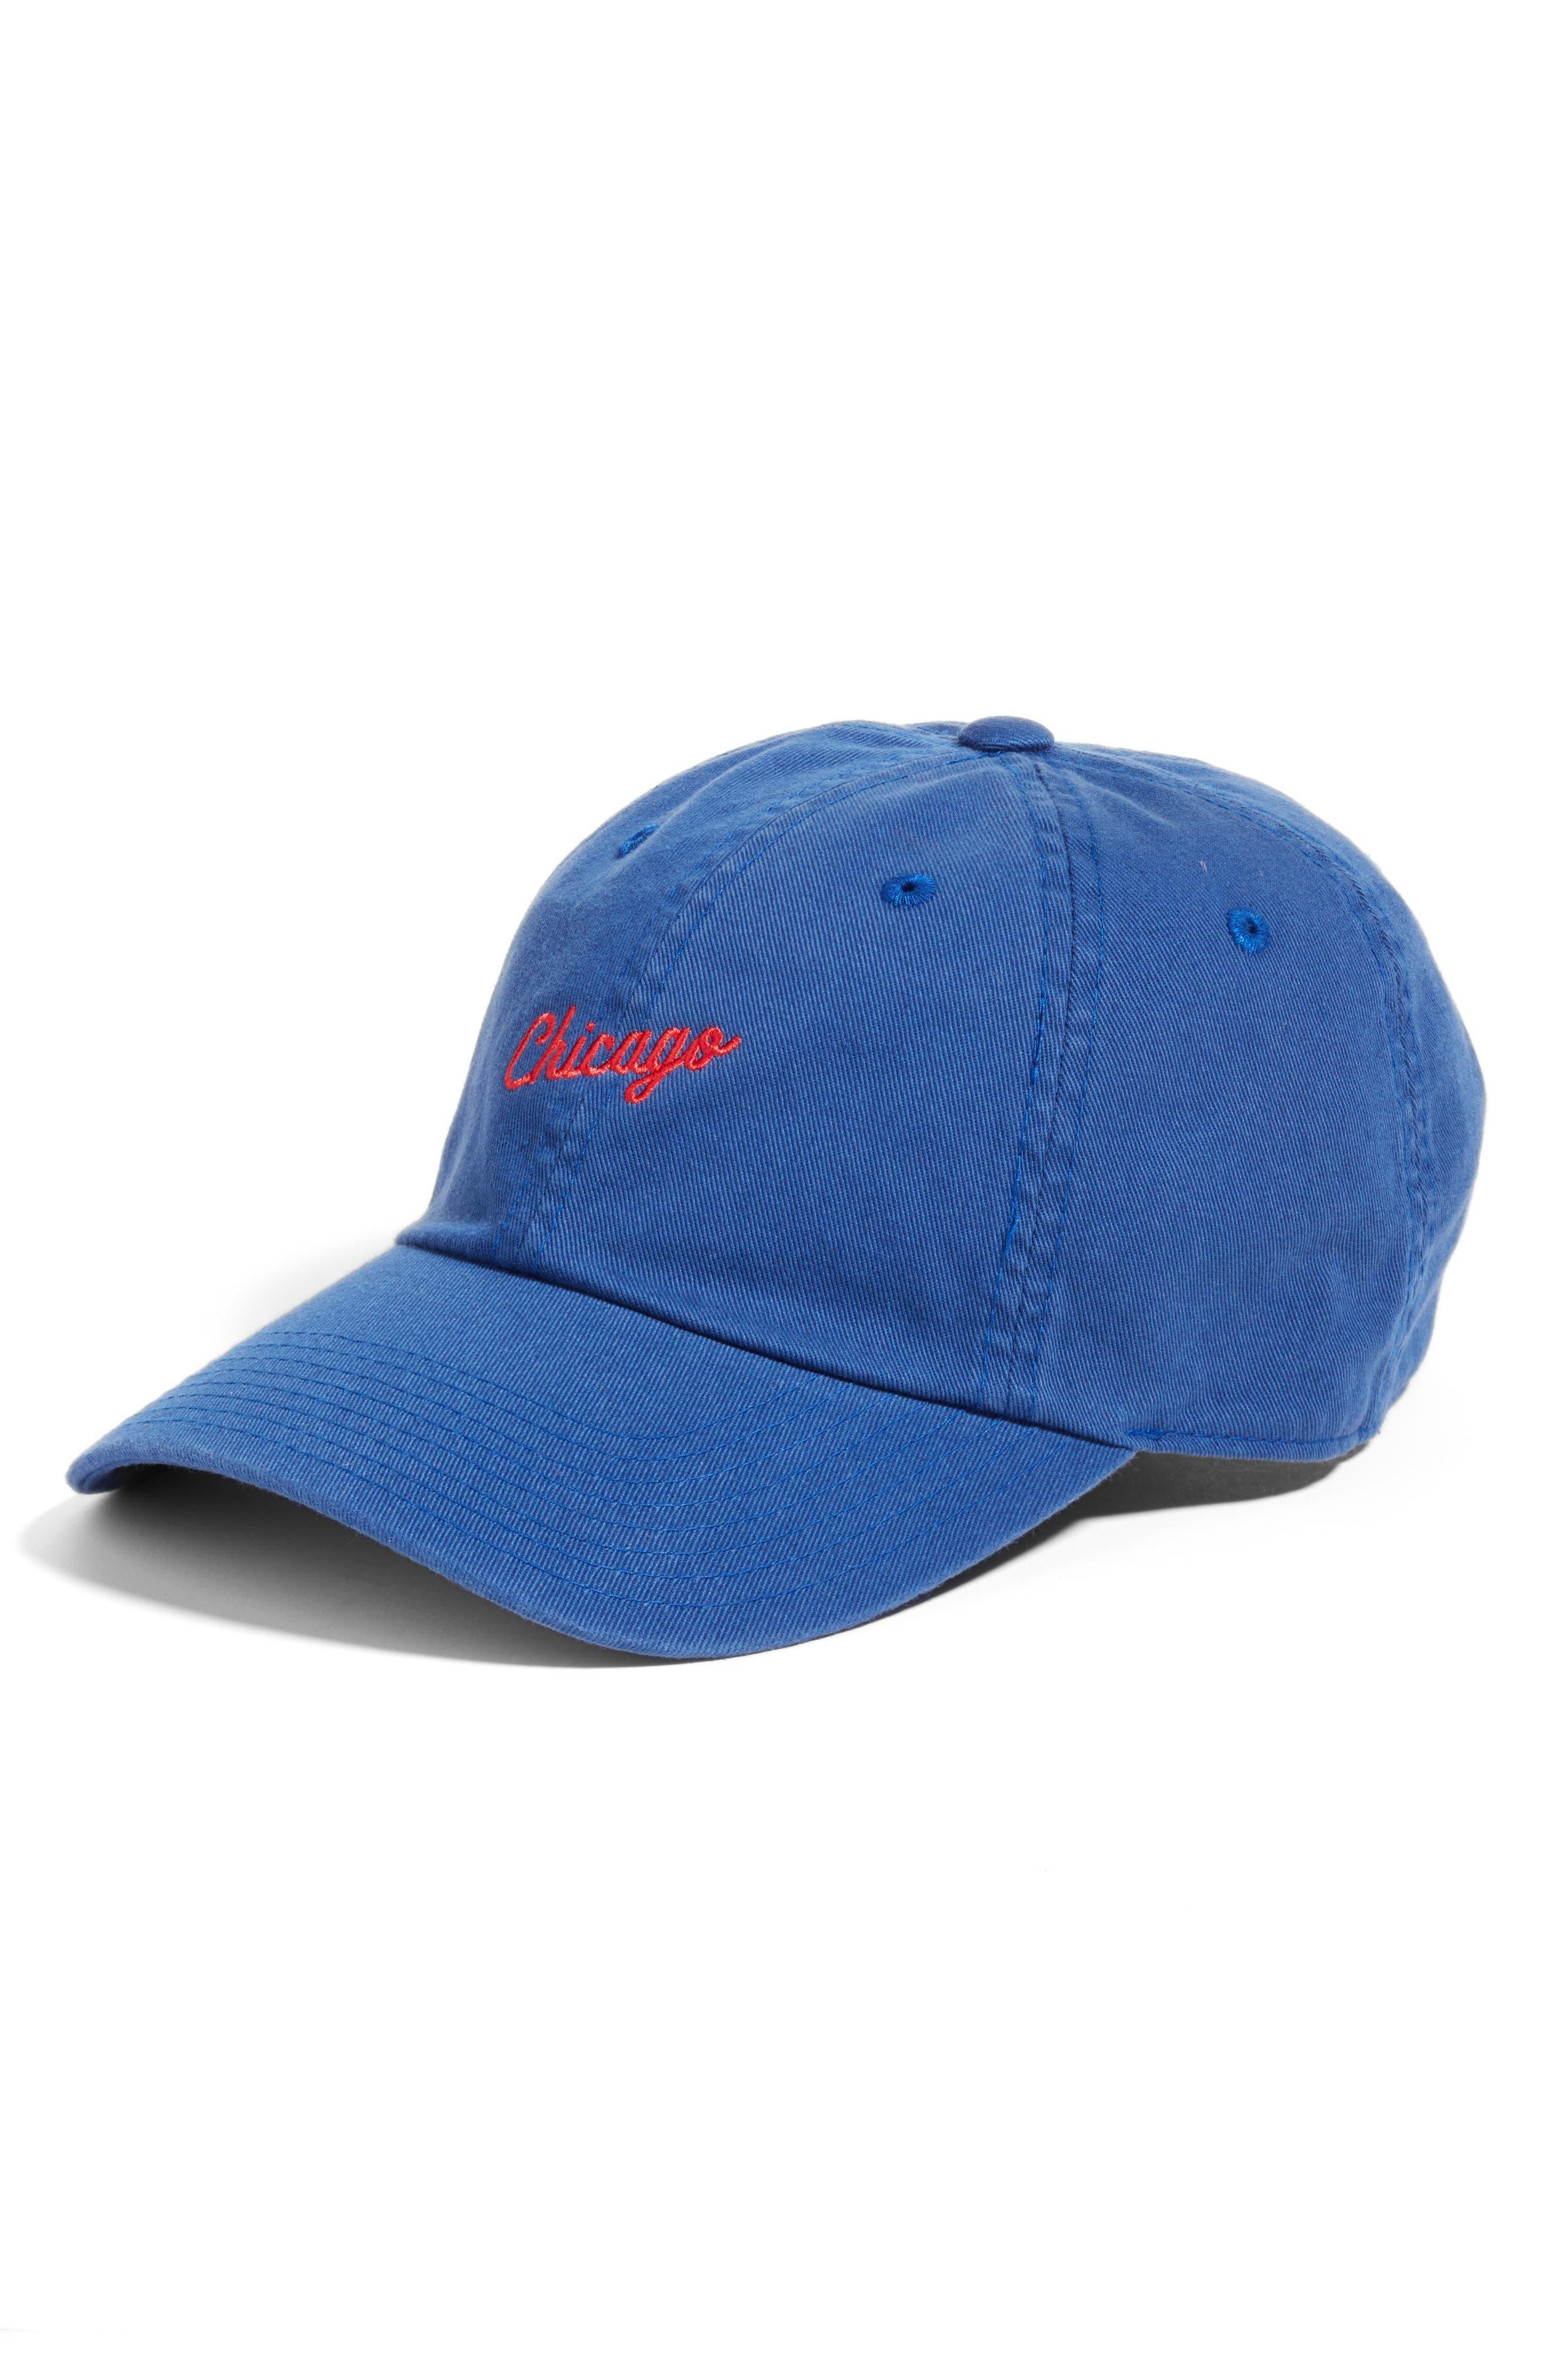 Main Image - American Needle Boardshort - Chicago Baseball Cap